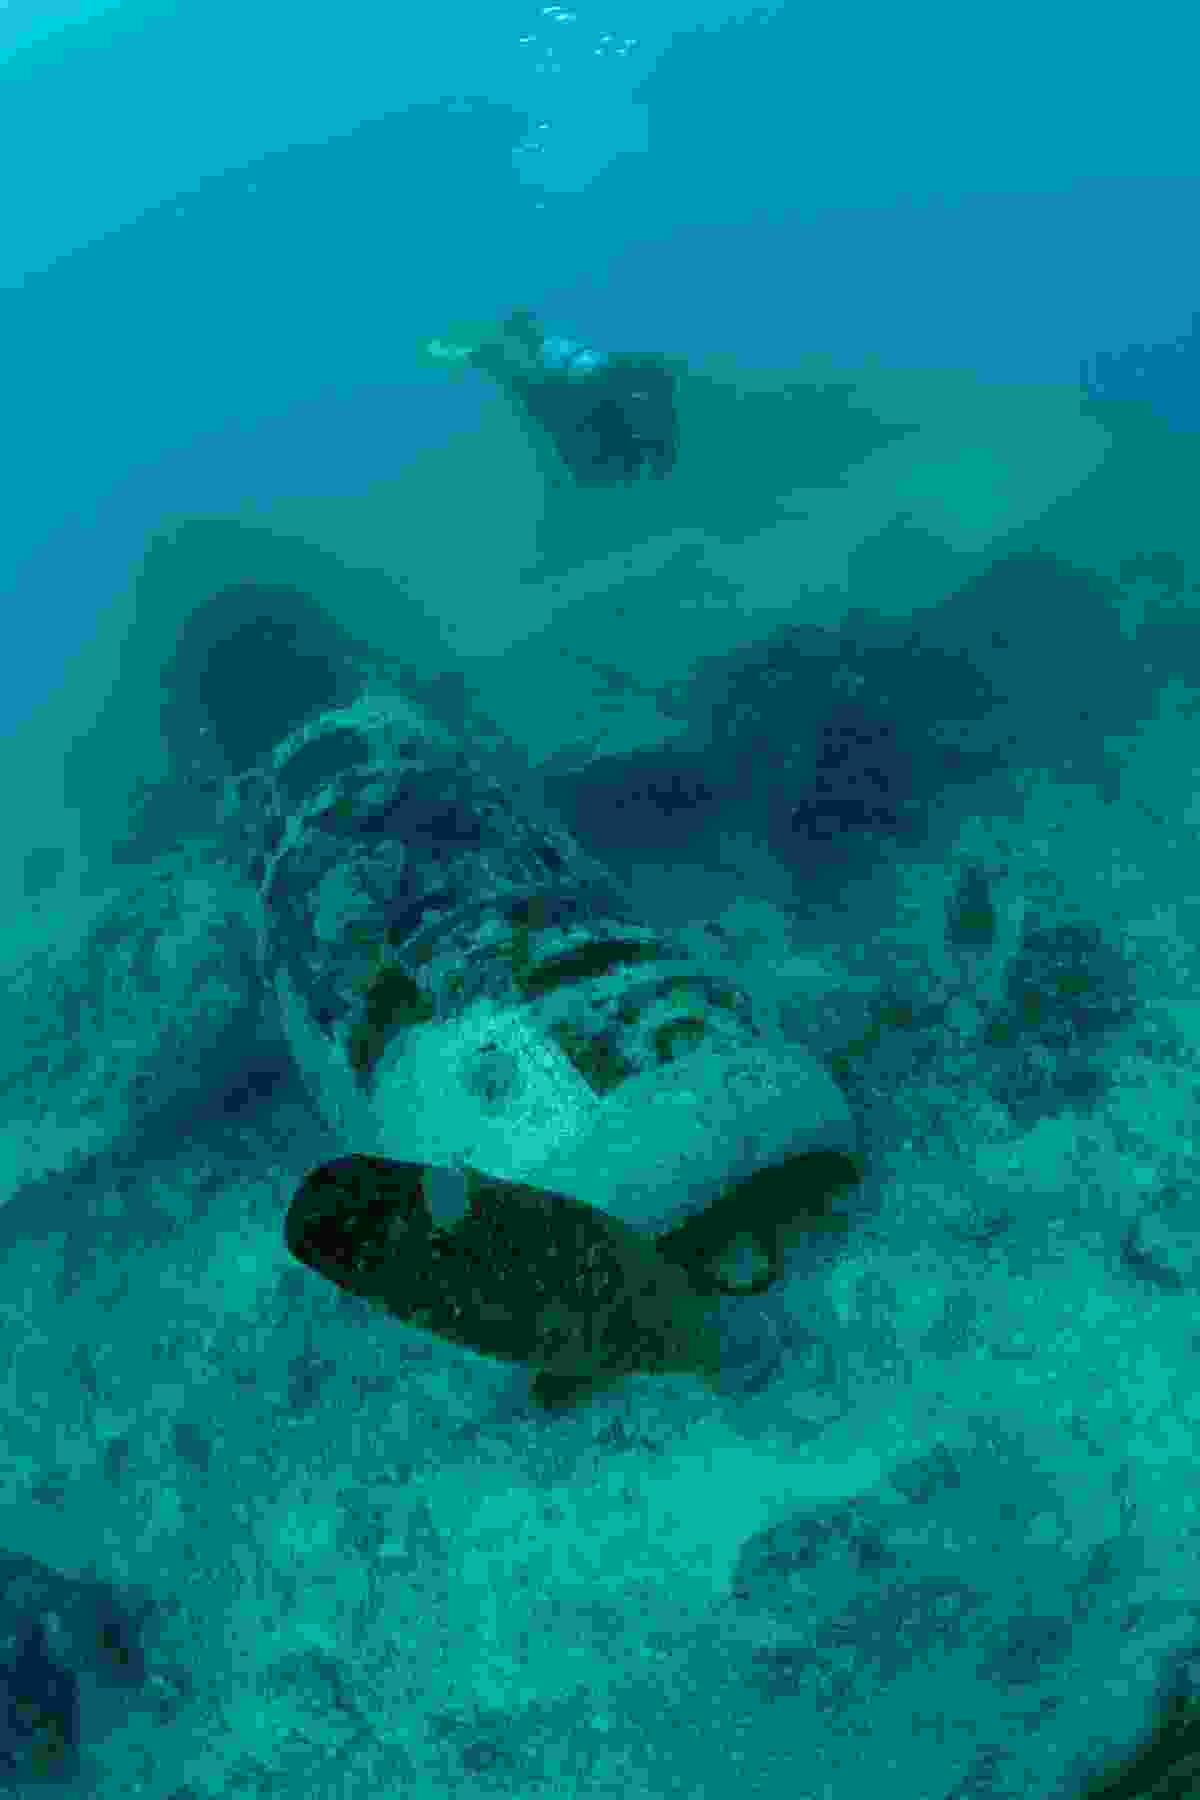 Diving among a plane wreck (PNGTPA)